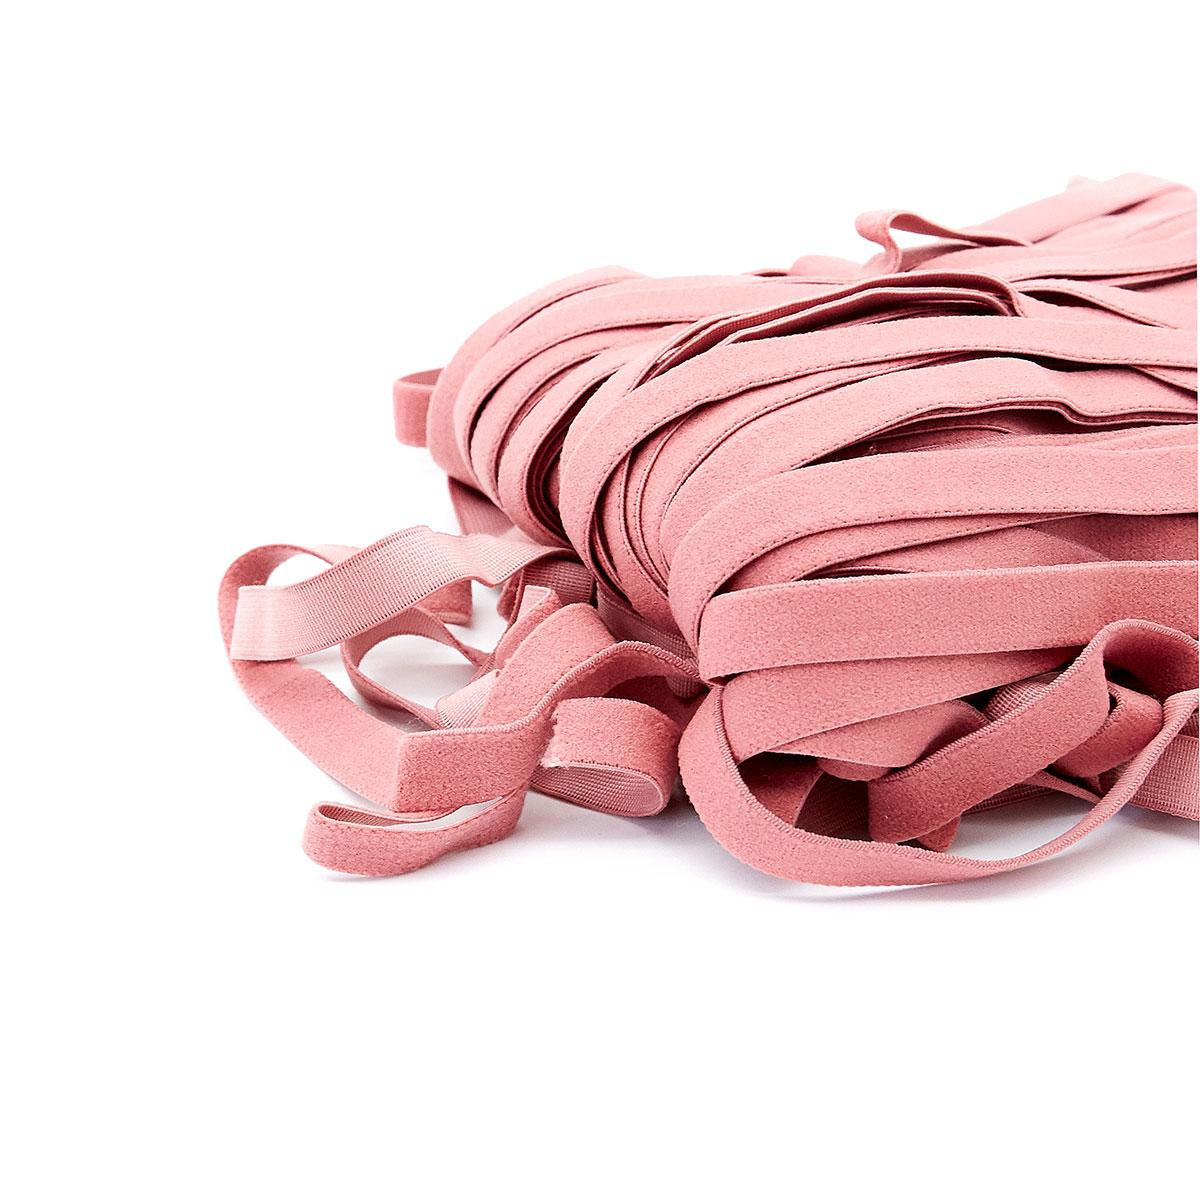 STD/68 эластичная отделочная лента 12мм*50м, темно-розовый